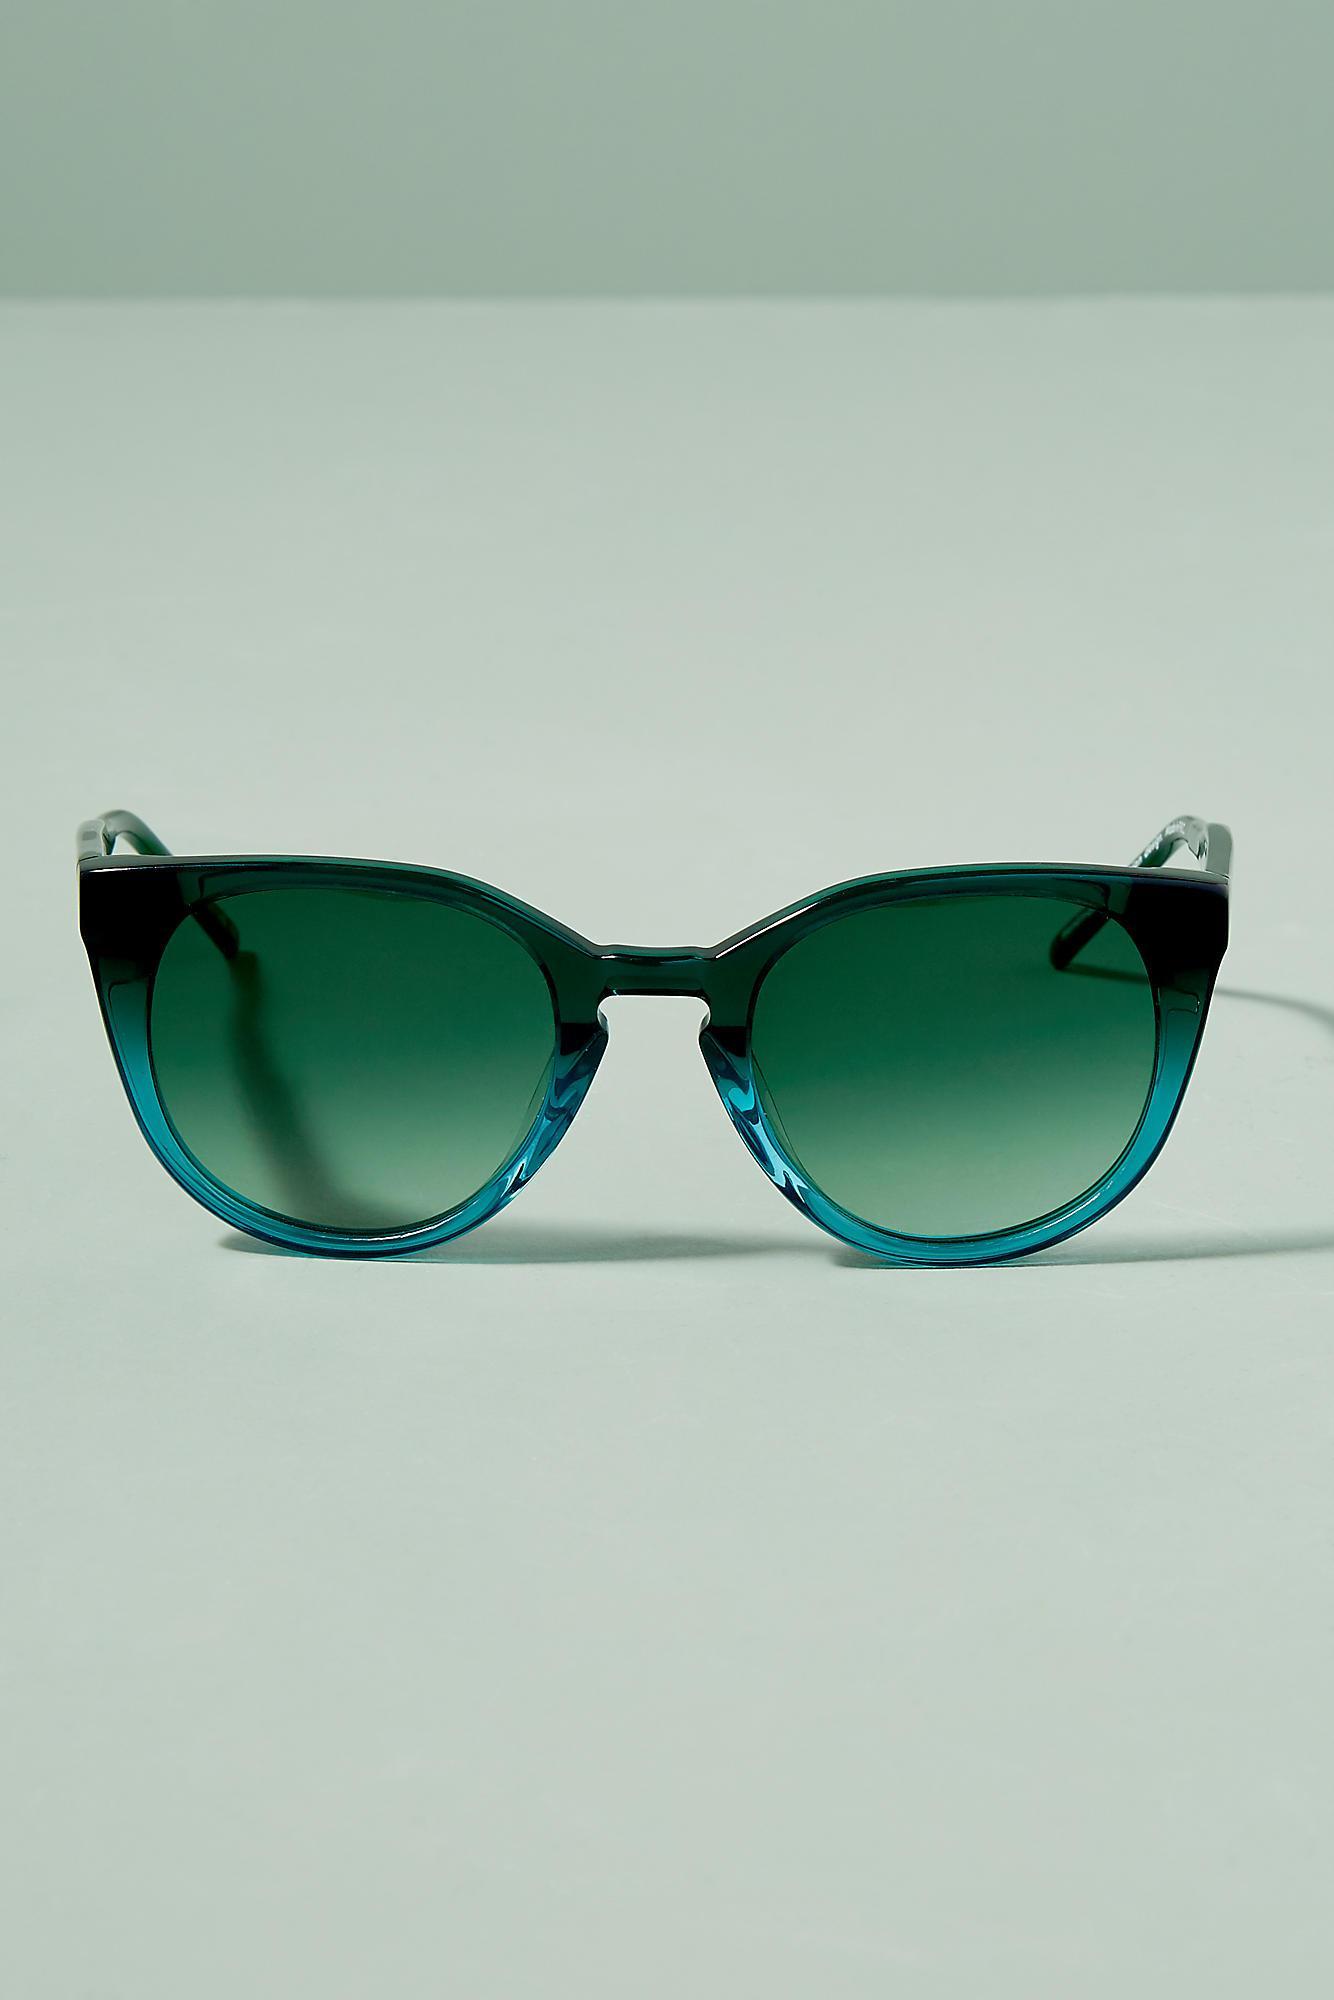 Anthropologie Kaibosh Gradient Cat-eye Sunglasses in Green